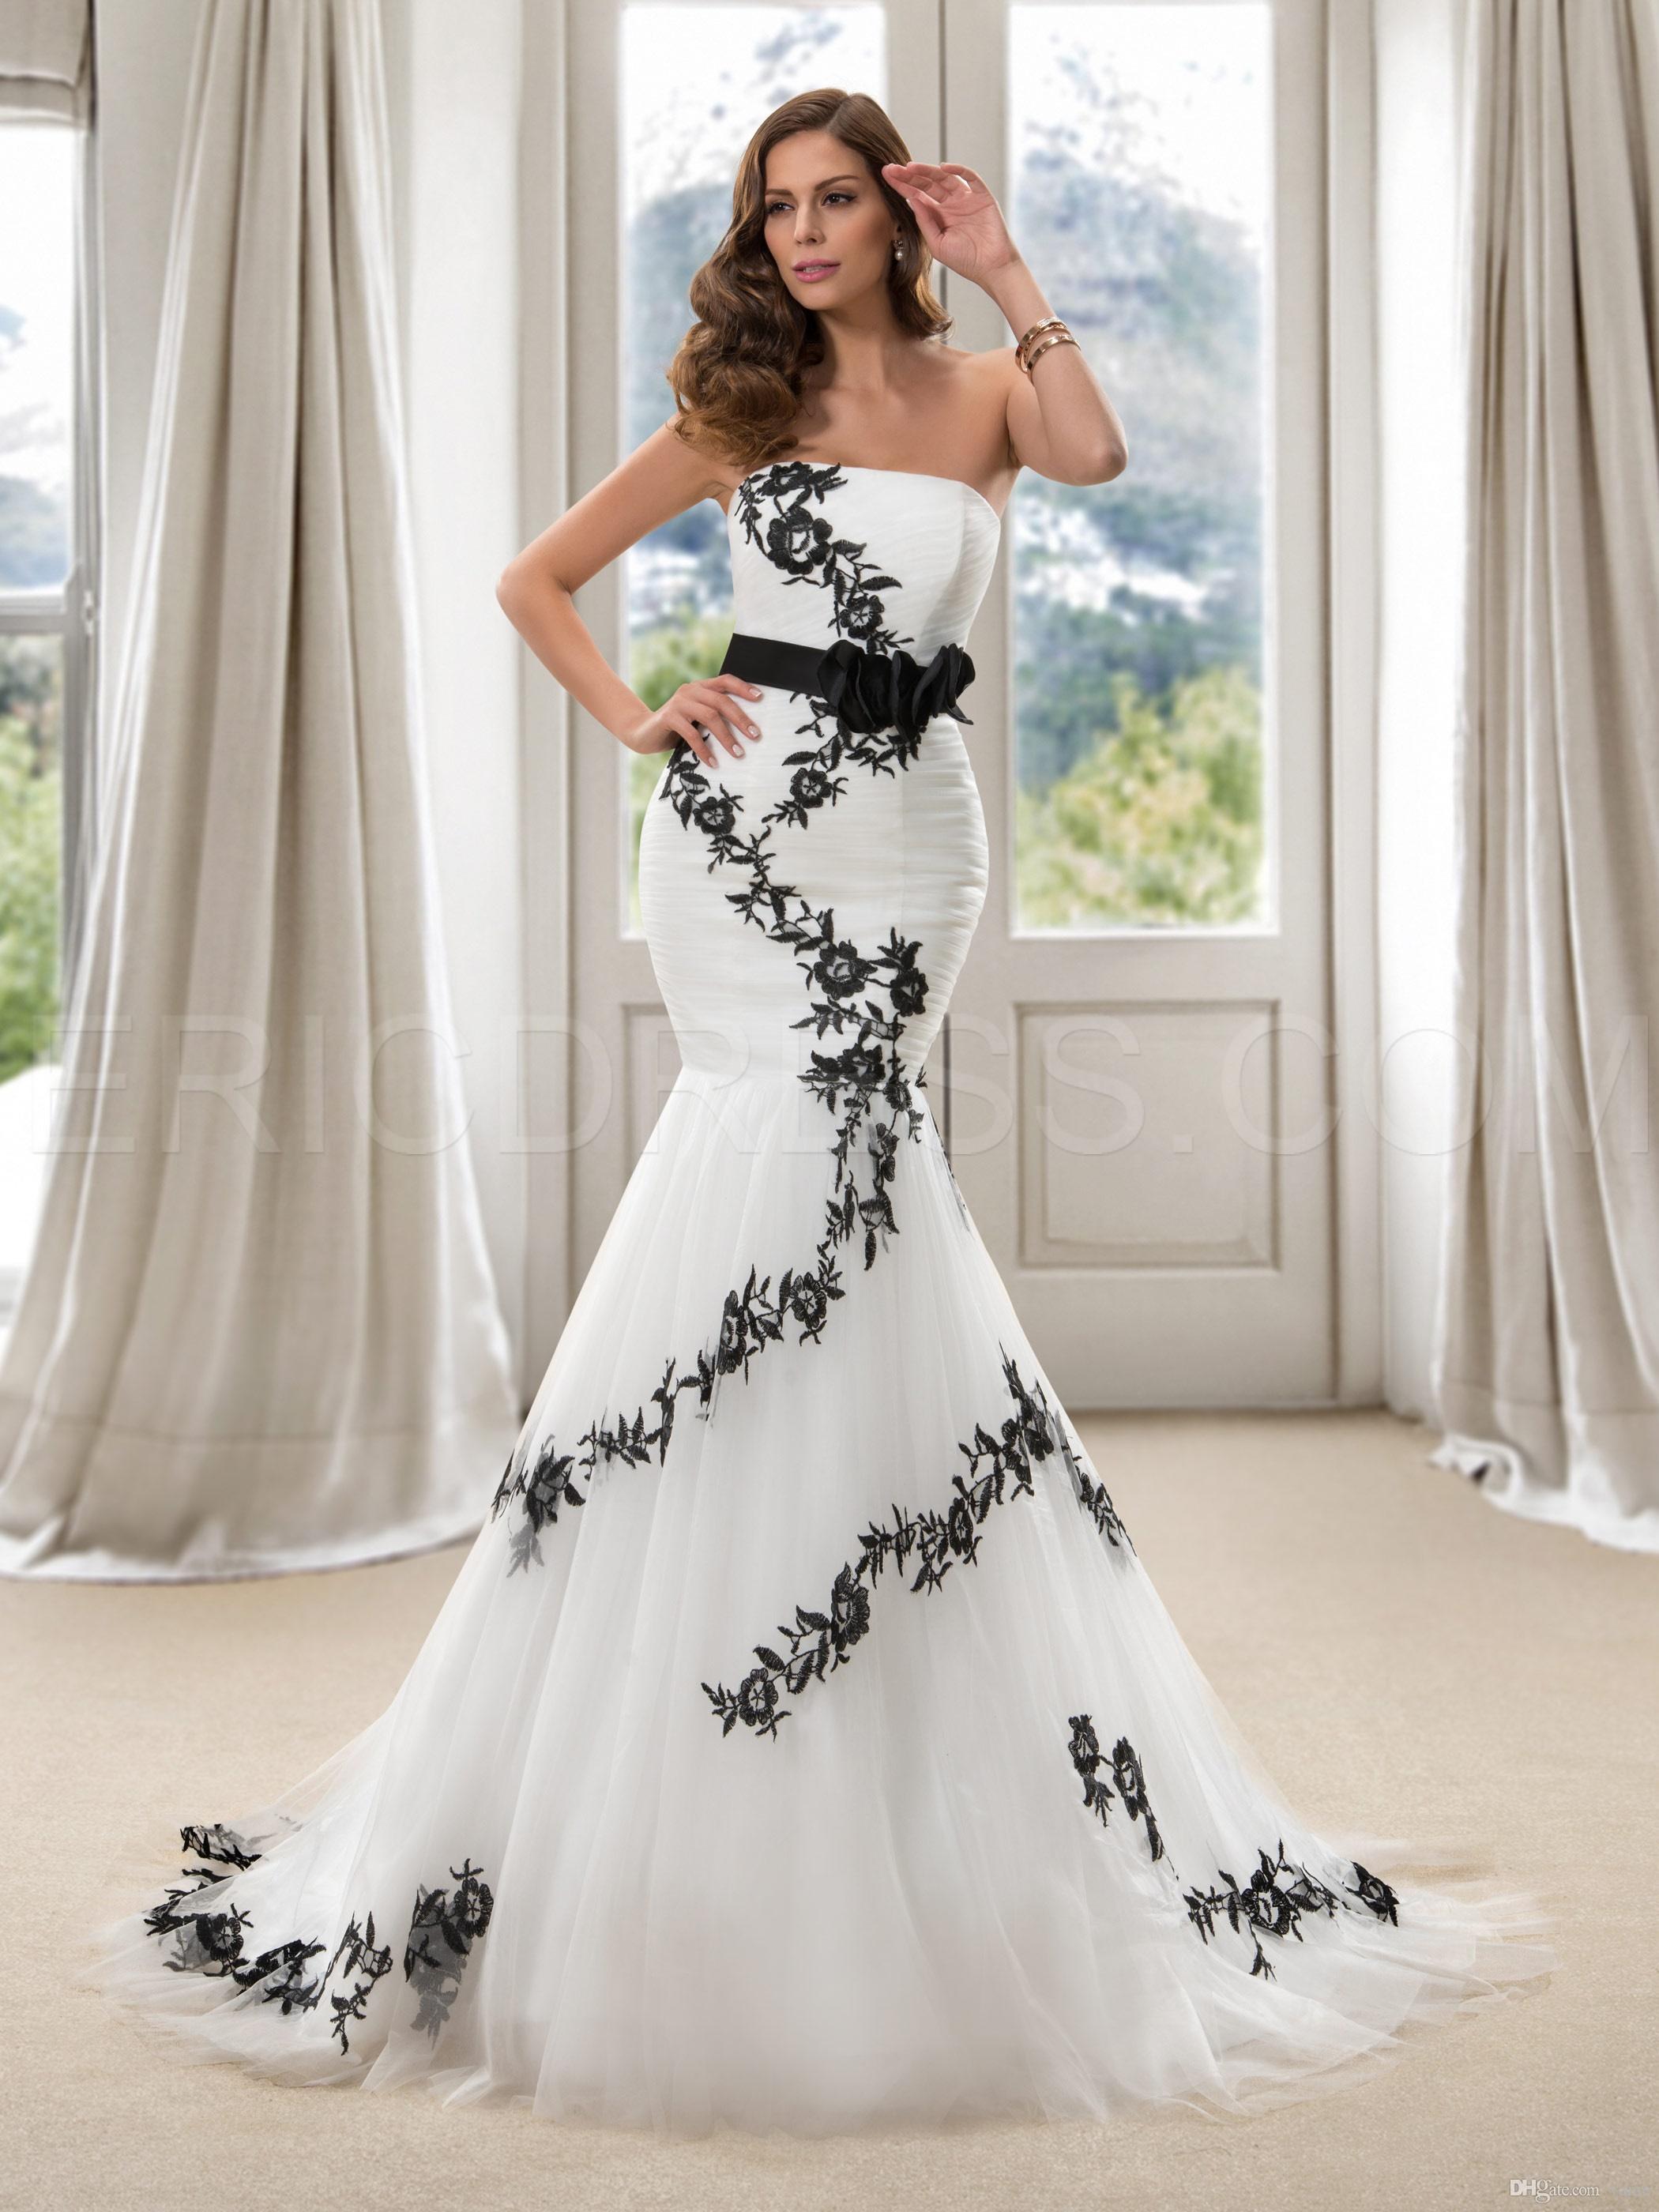 Fashionable wedding dresses 2018